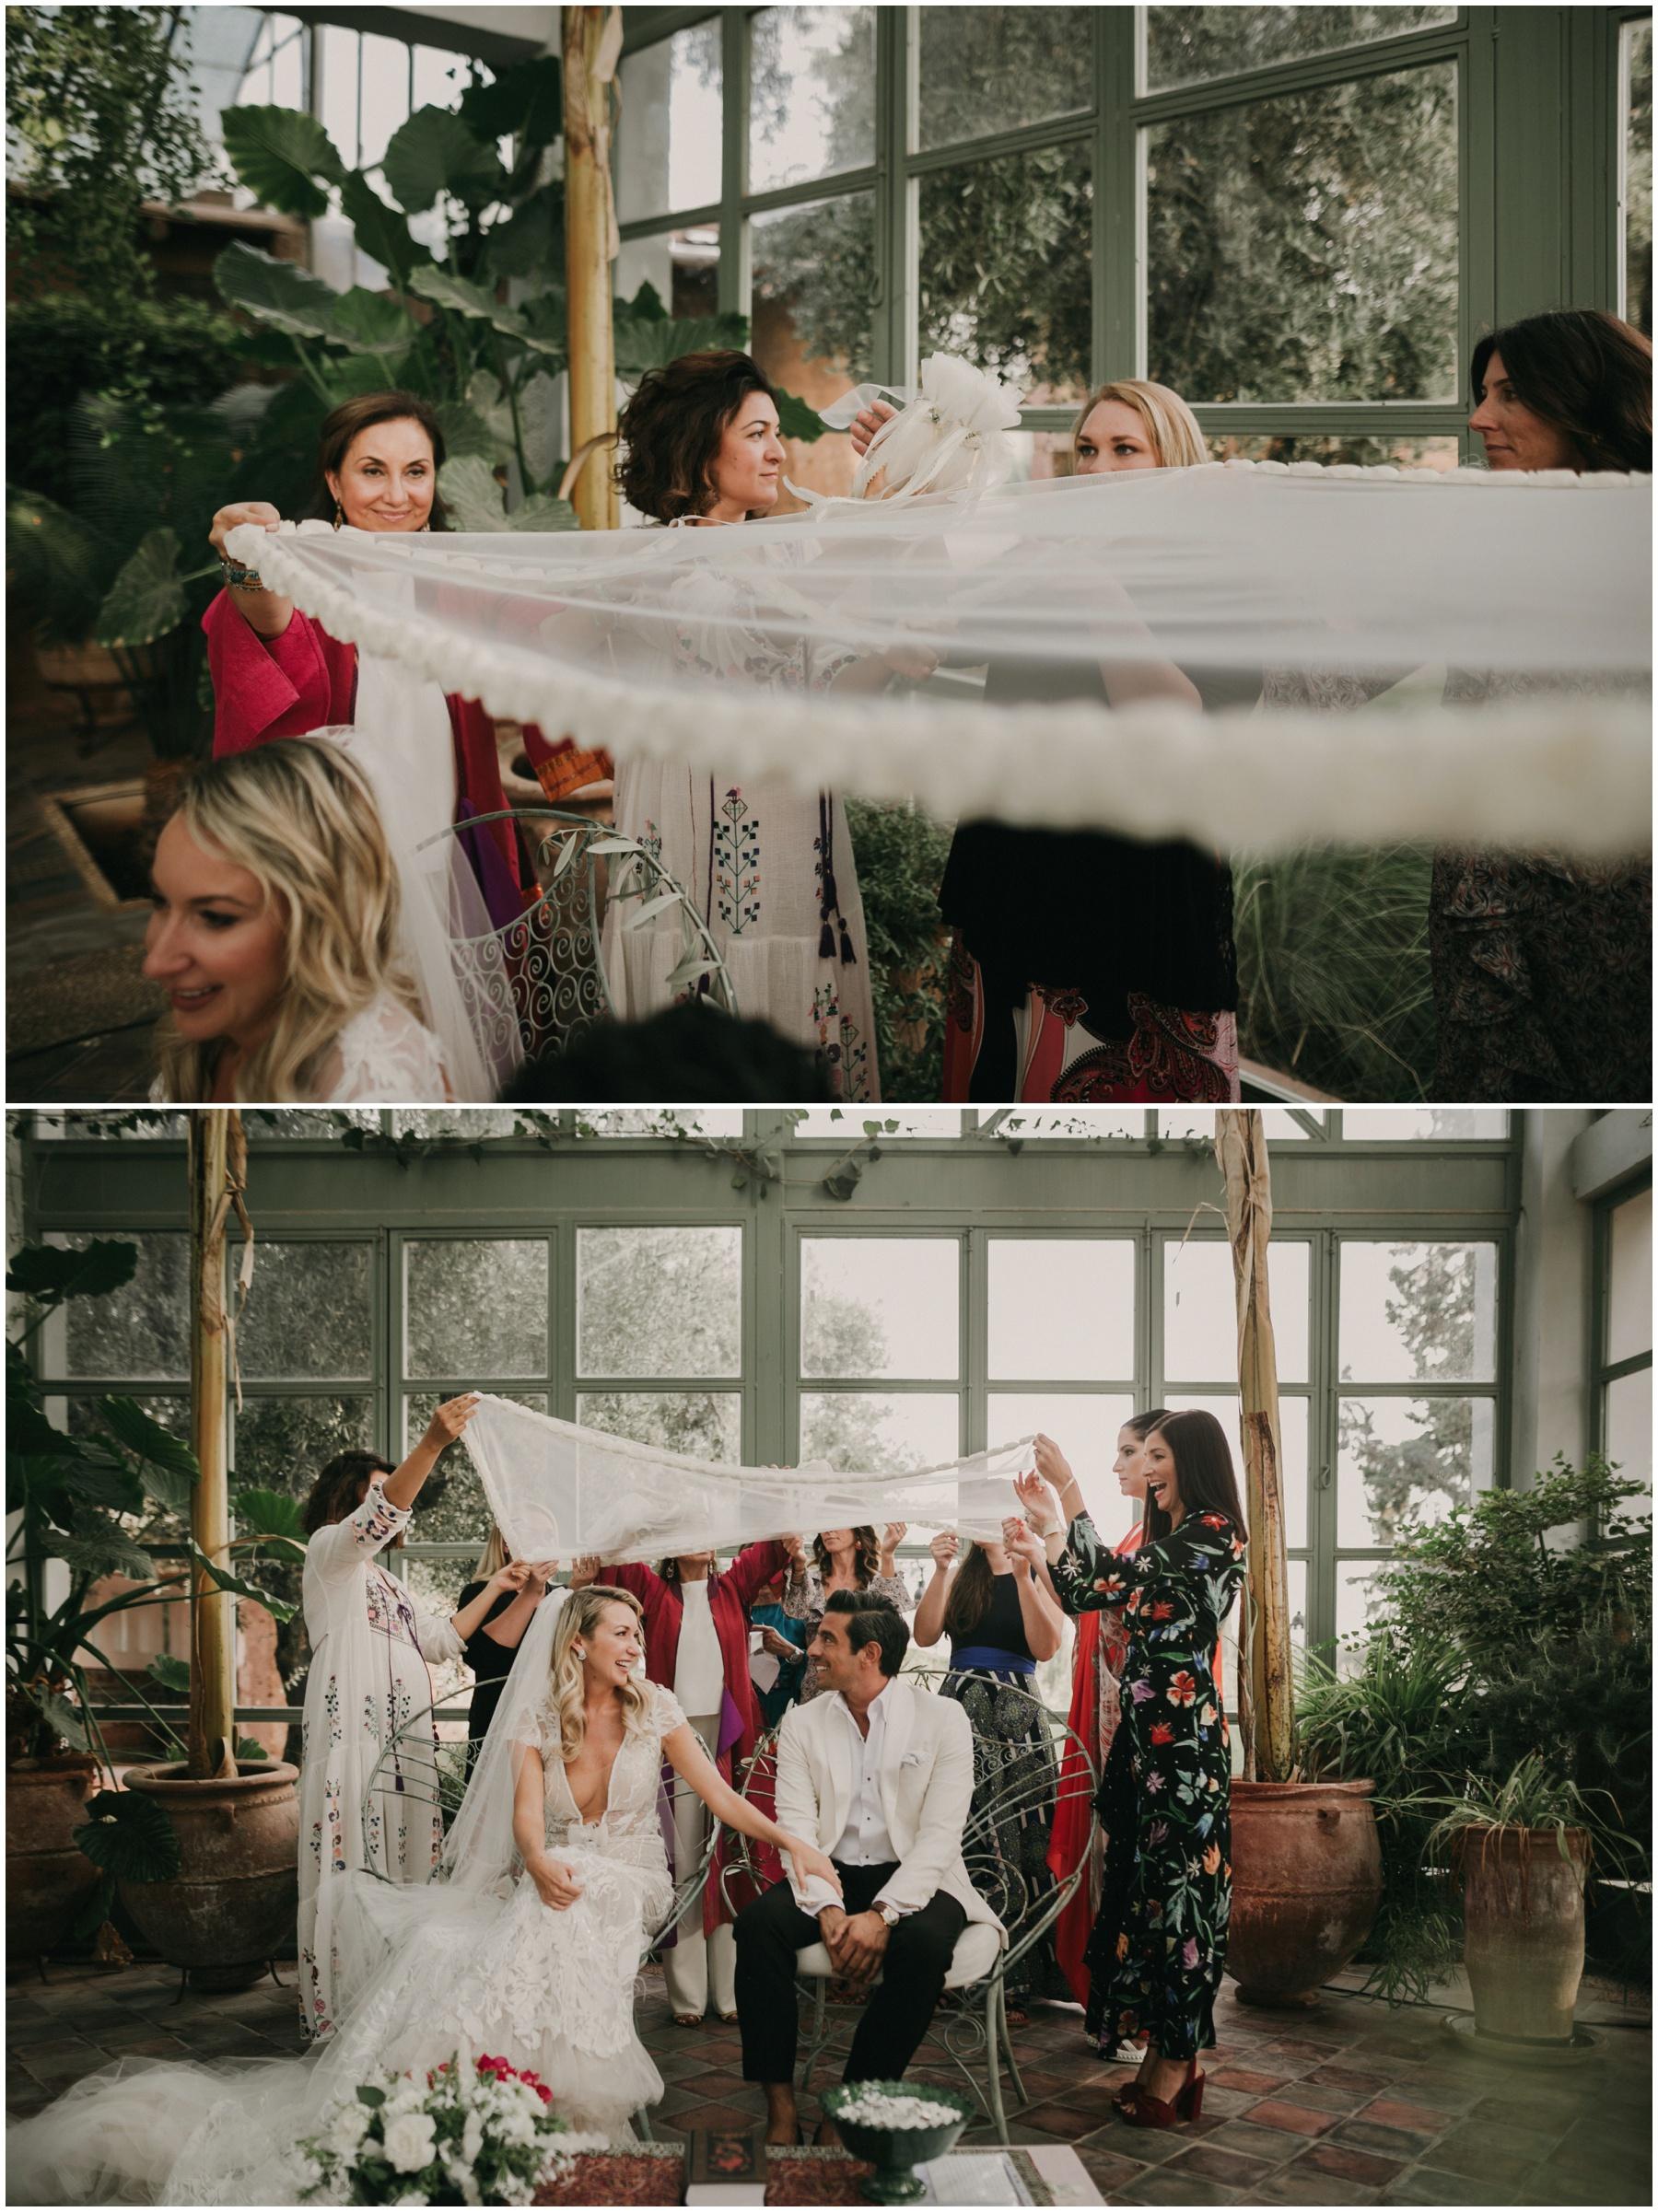 Marrakech Wedding Beldi Coutry Club 047.JPG